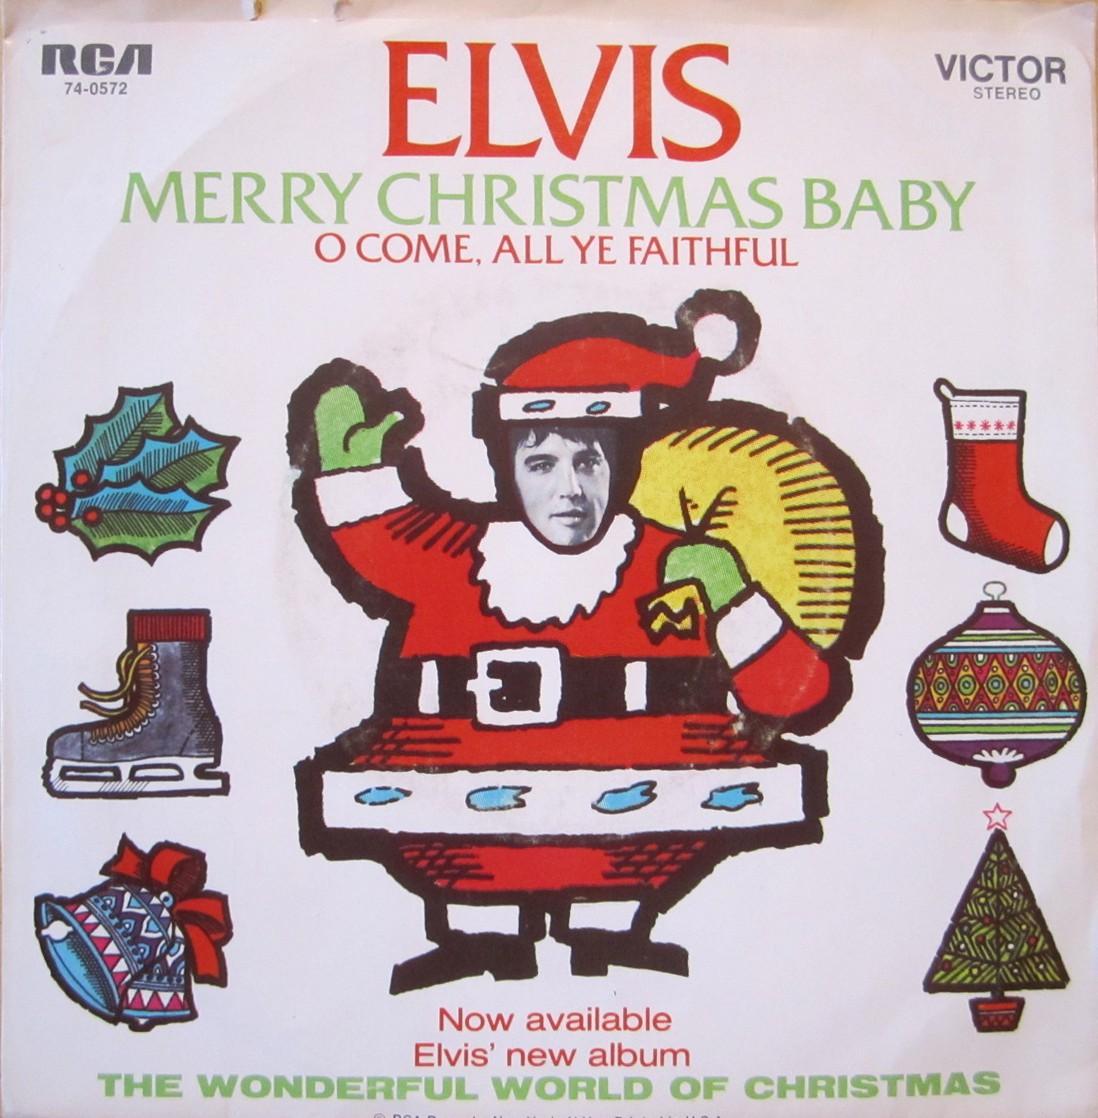 Merry Christmas Baby / O Come All Ye Faithful 74-0572arkuqh